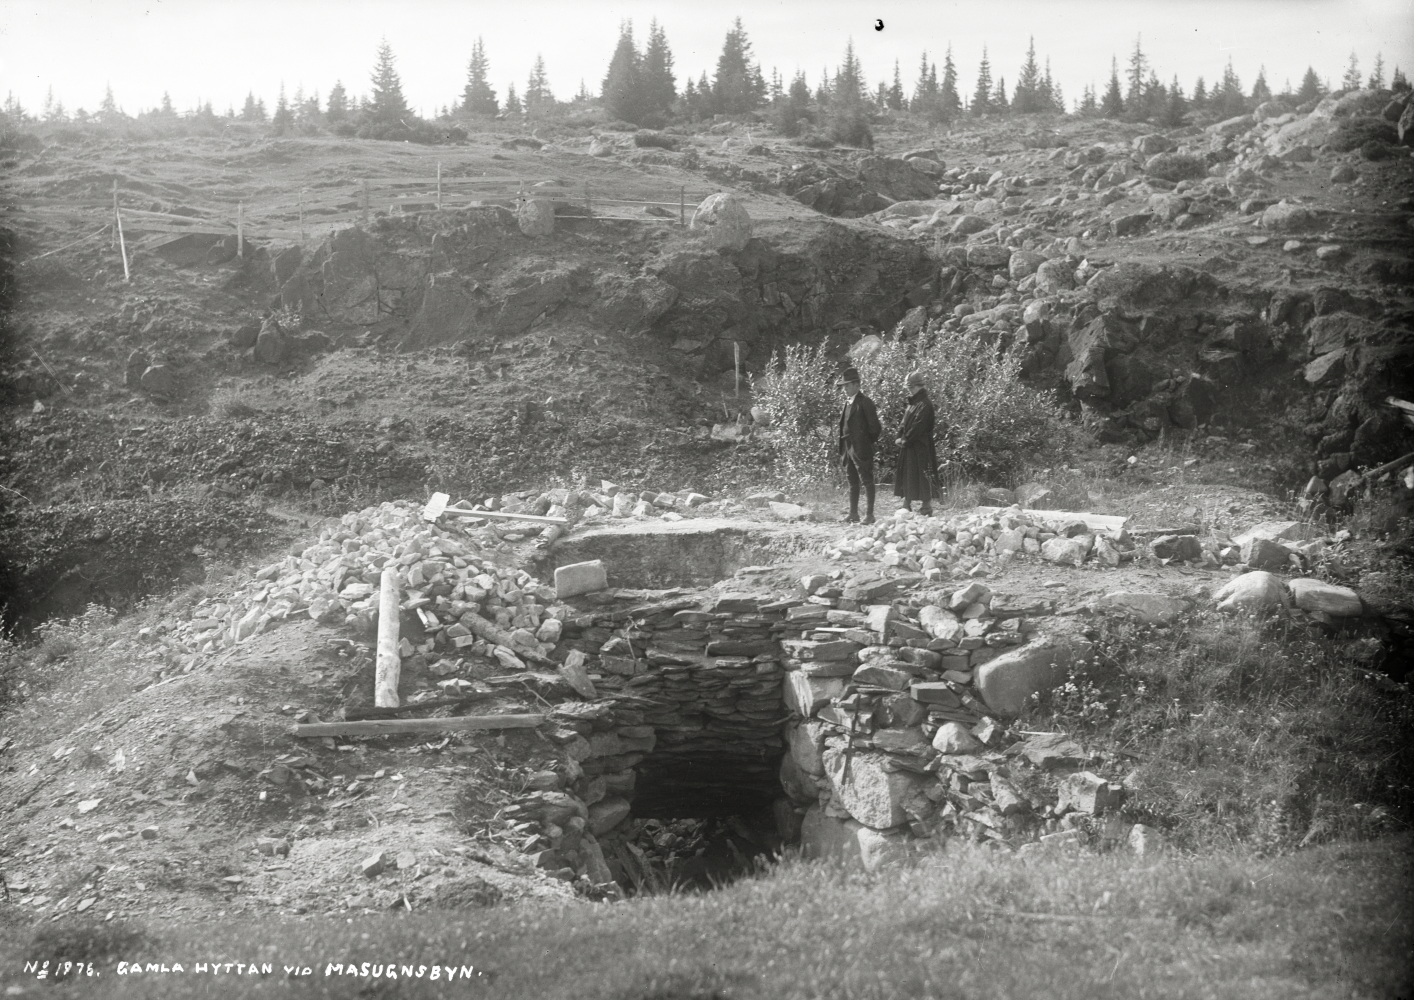 Gamla hyttan i Masugnsbyn den 1 september 1924.